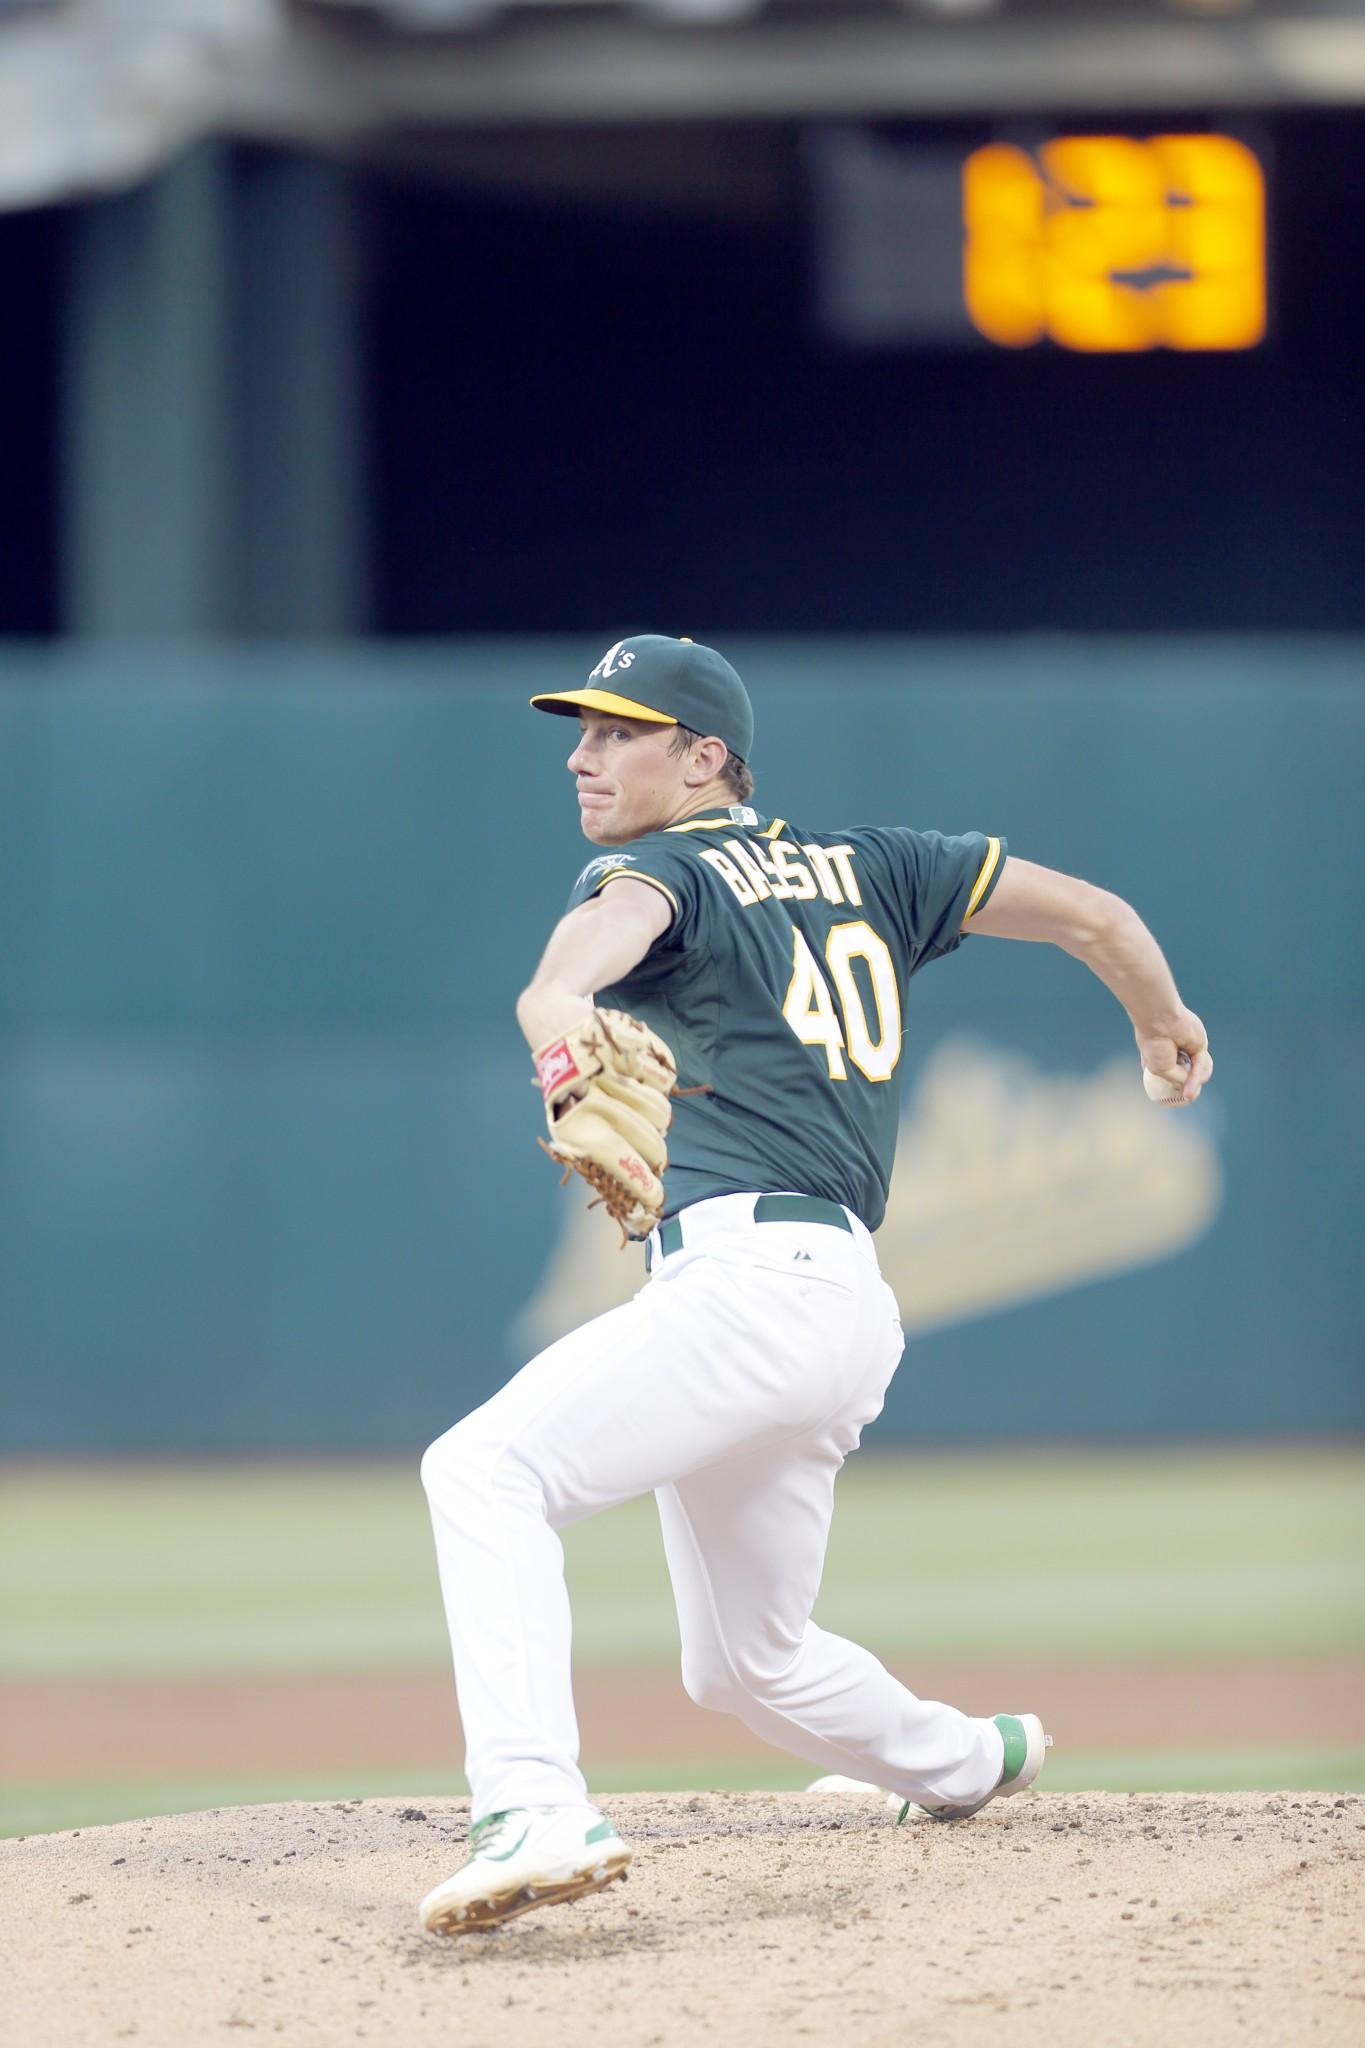 Oakland Athletics pitcher Chris Bassitt (Genoa/University of Akron). (Photo courtesy Oakland A's)